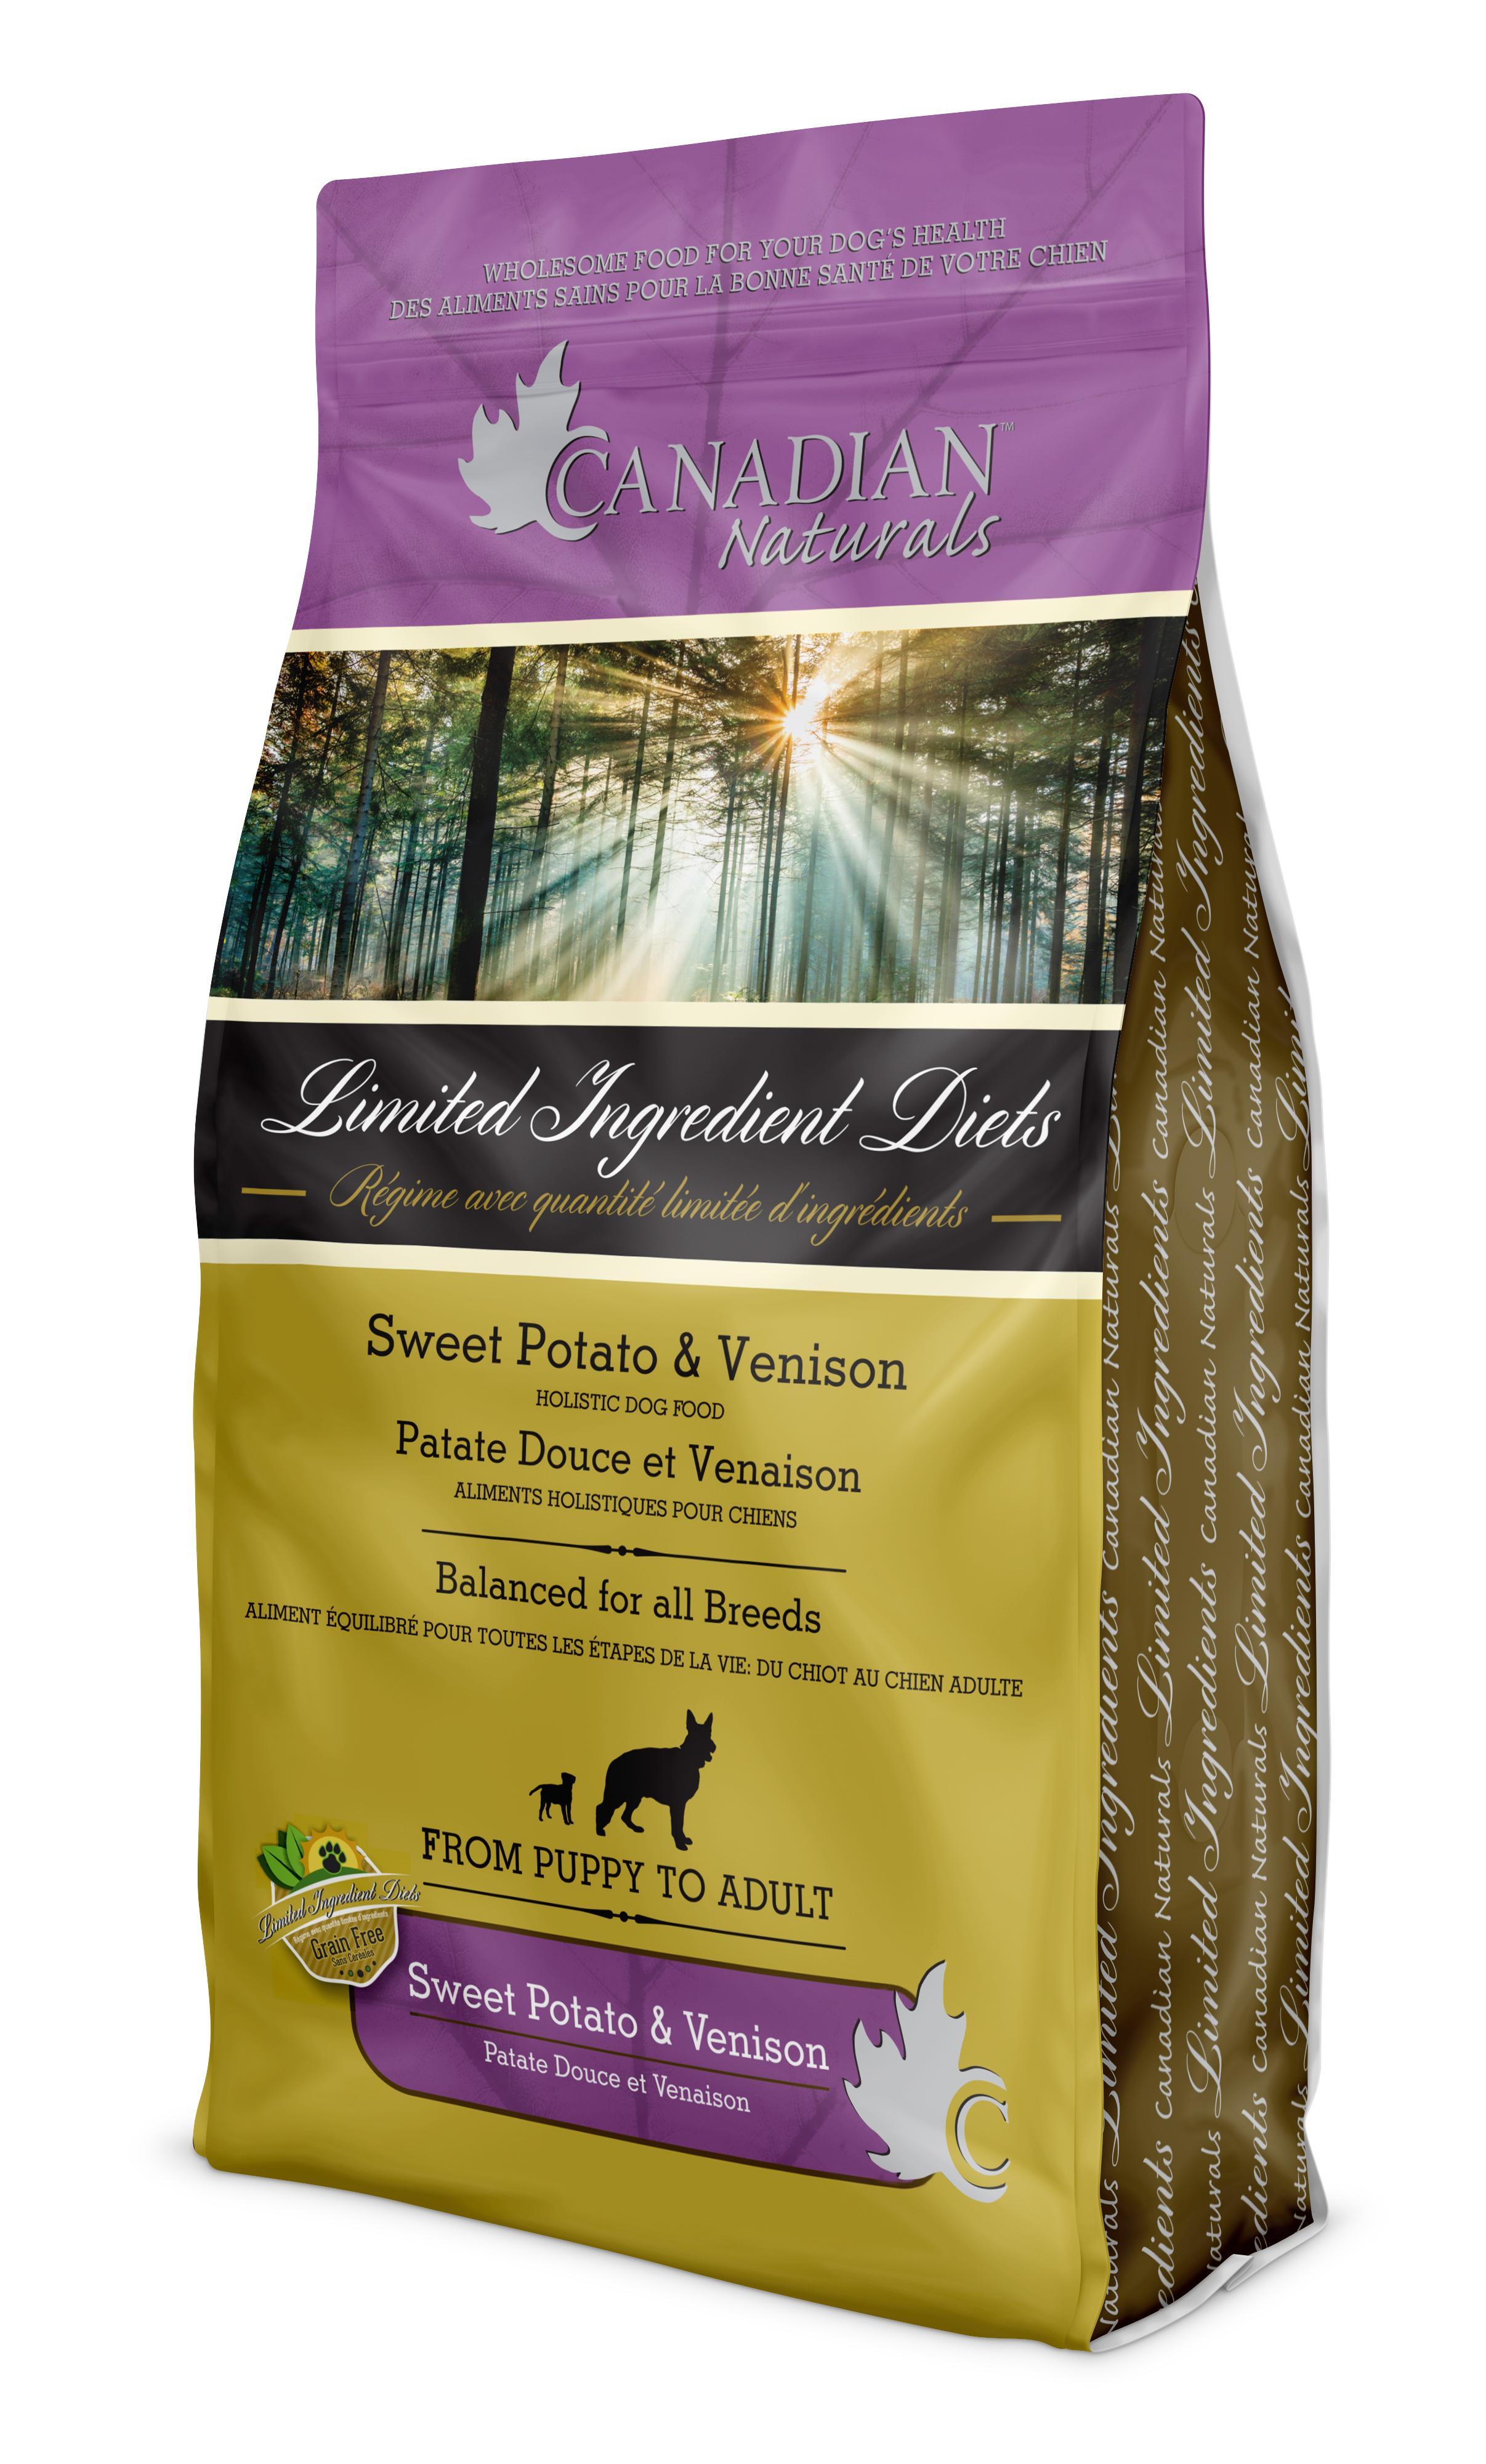 Canadian Naturals LID Sweet Potato & Venison Dry Dog Food Image